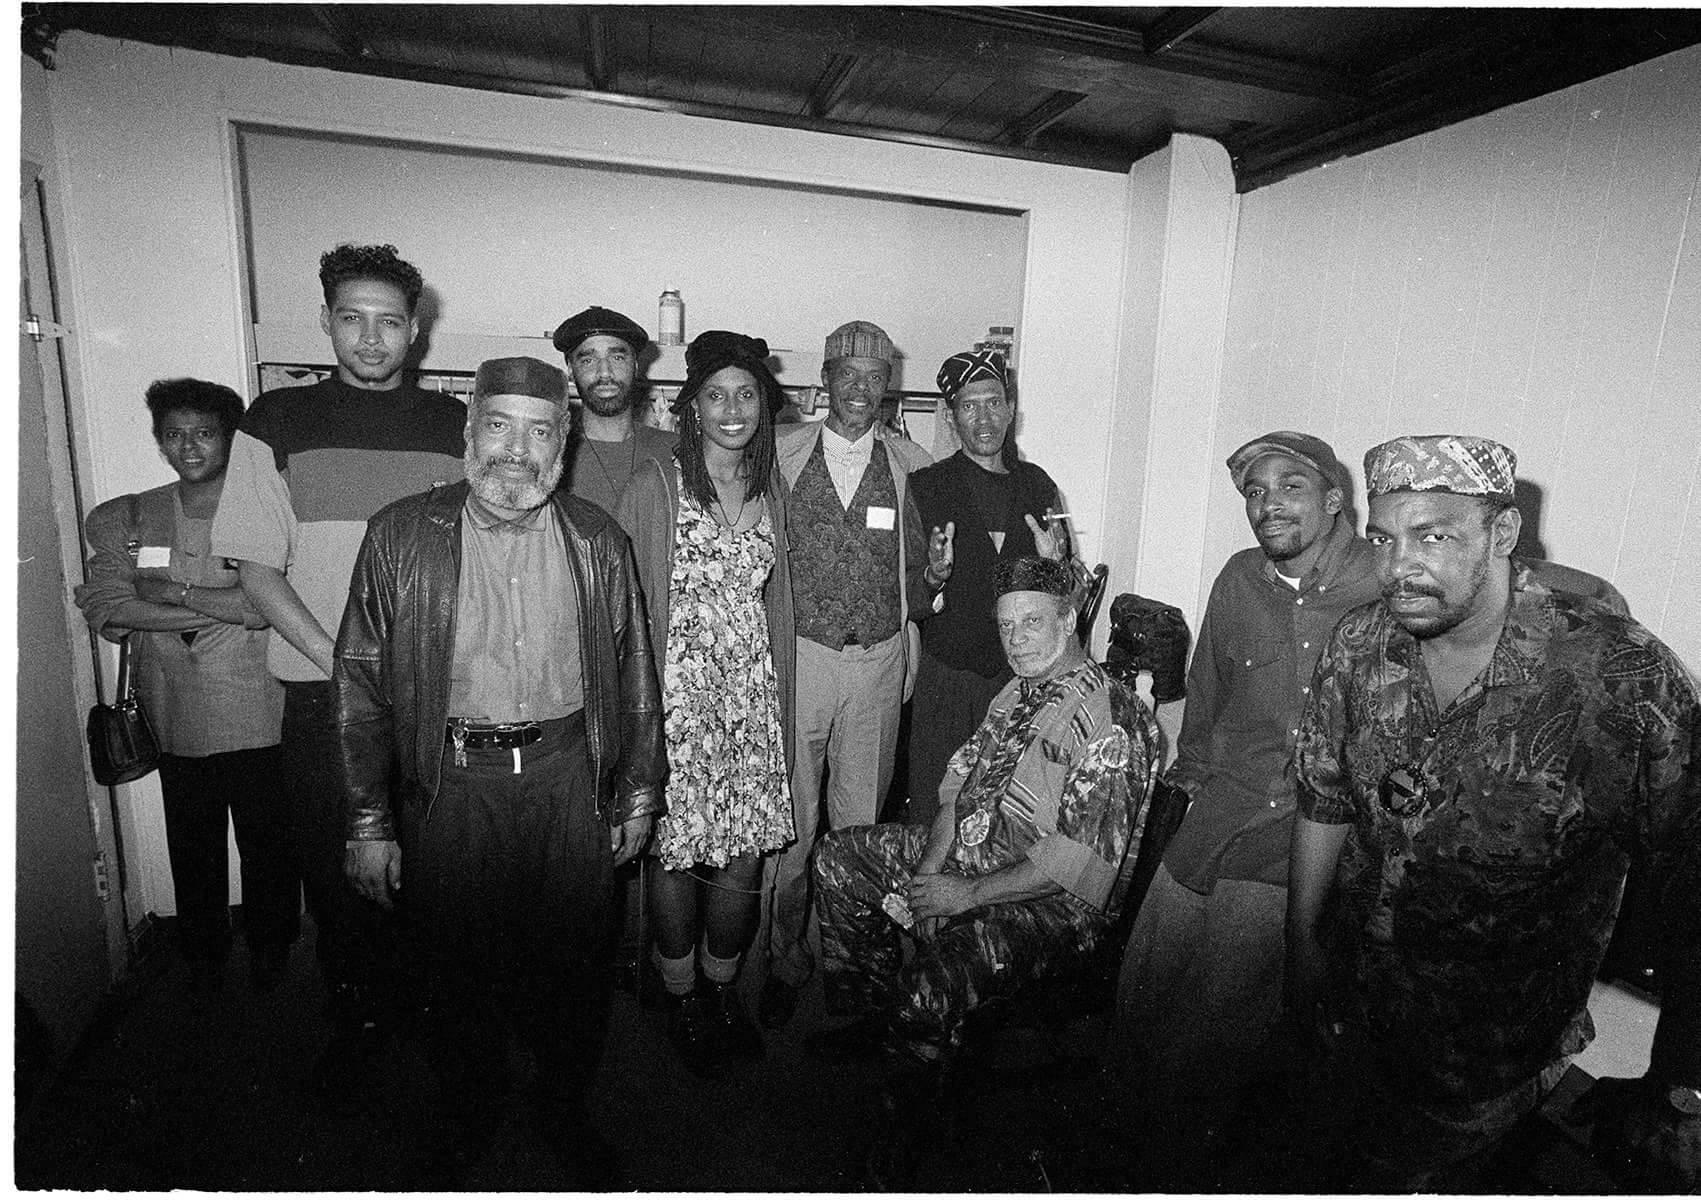 Mikah Nine, Father Amde, JMD, Horace Tapscott, Don Cherry, Richard Dedeaux, Aceyalone, and Otis O. Solomon. (photo: B+)